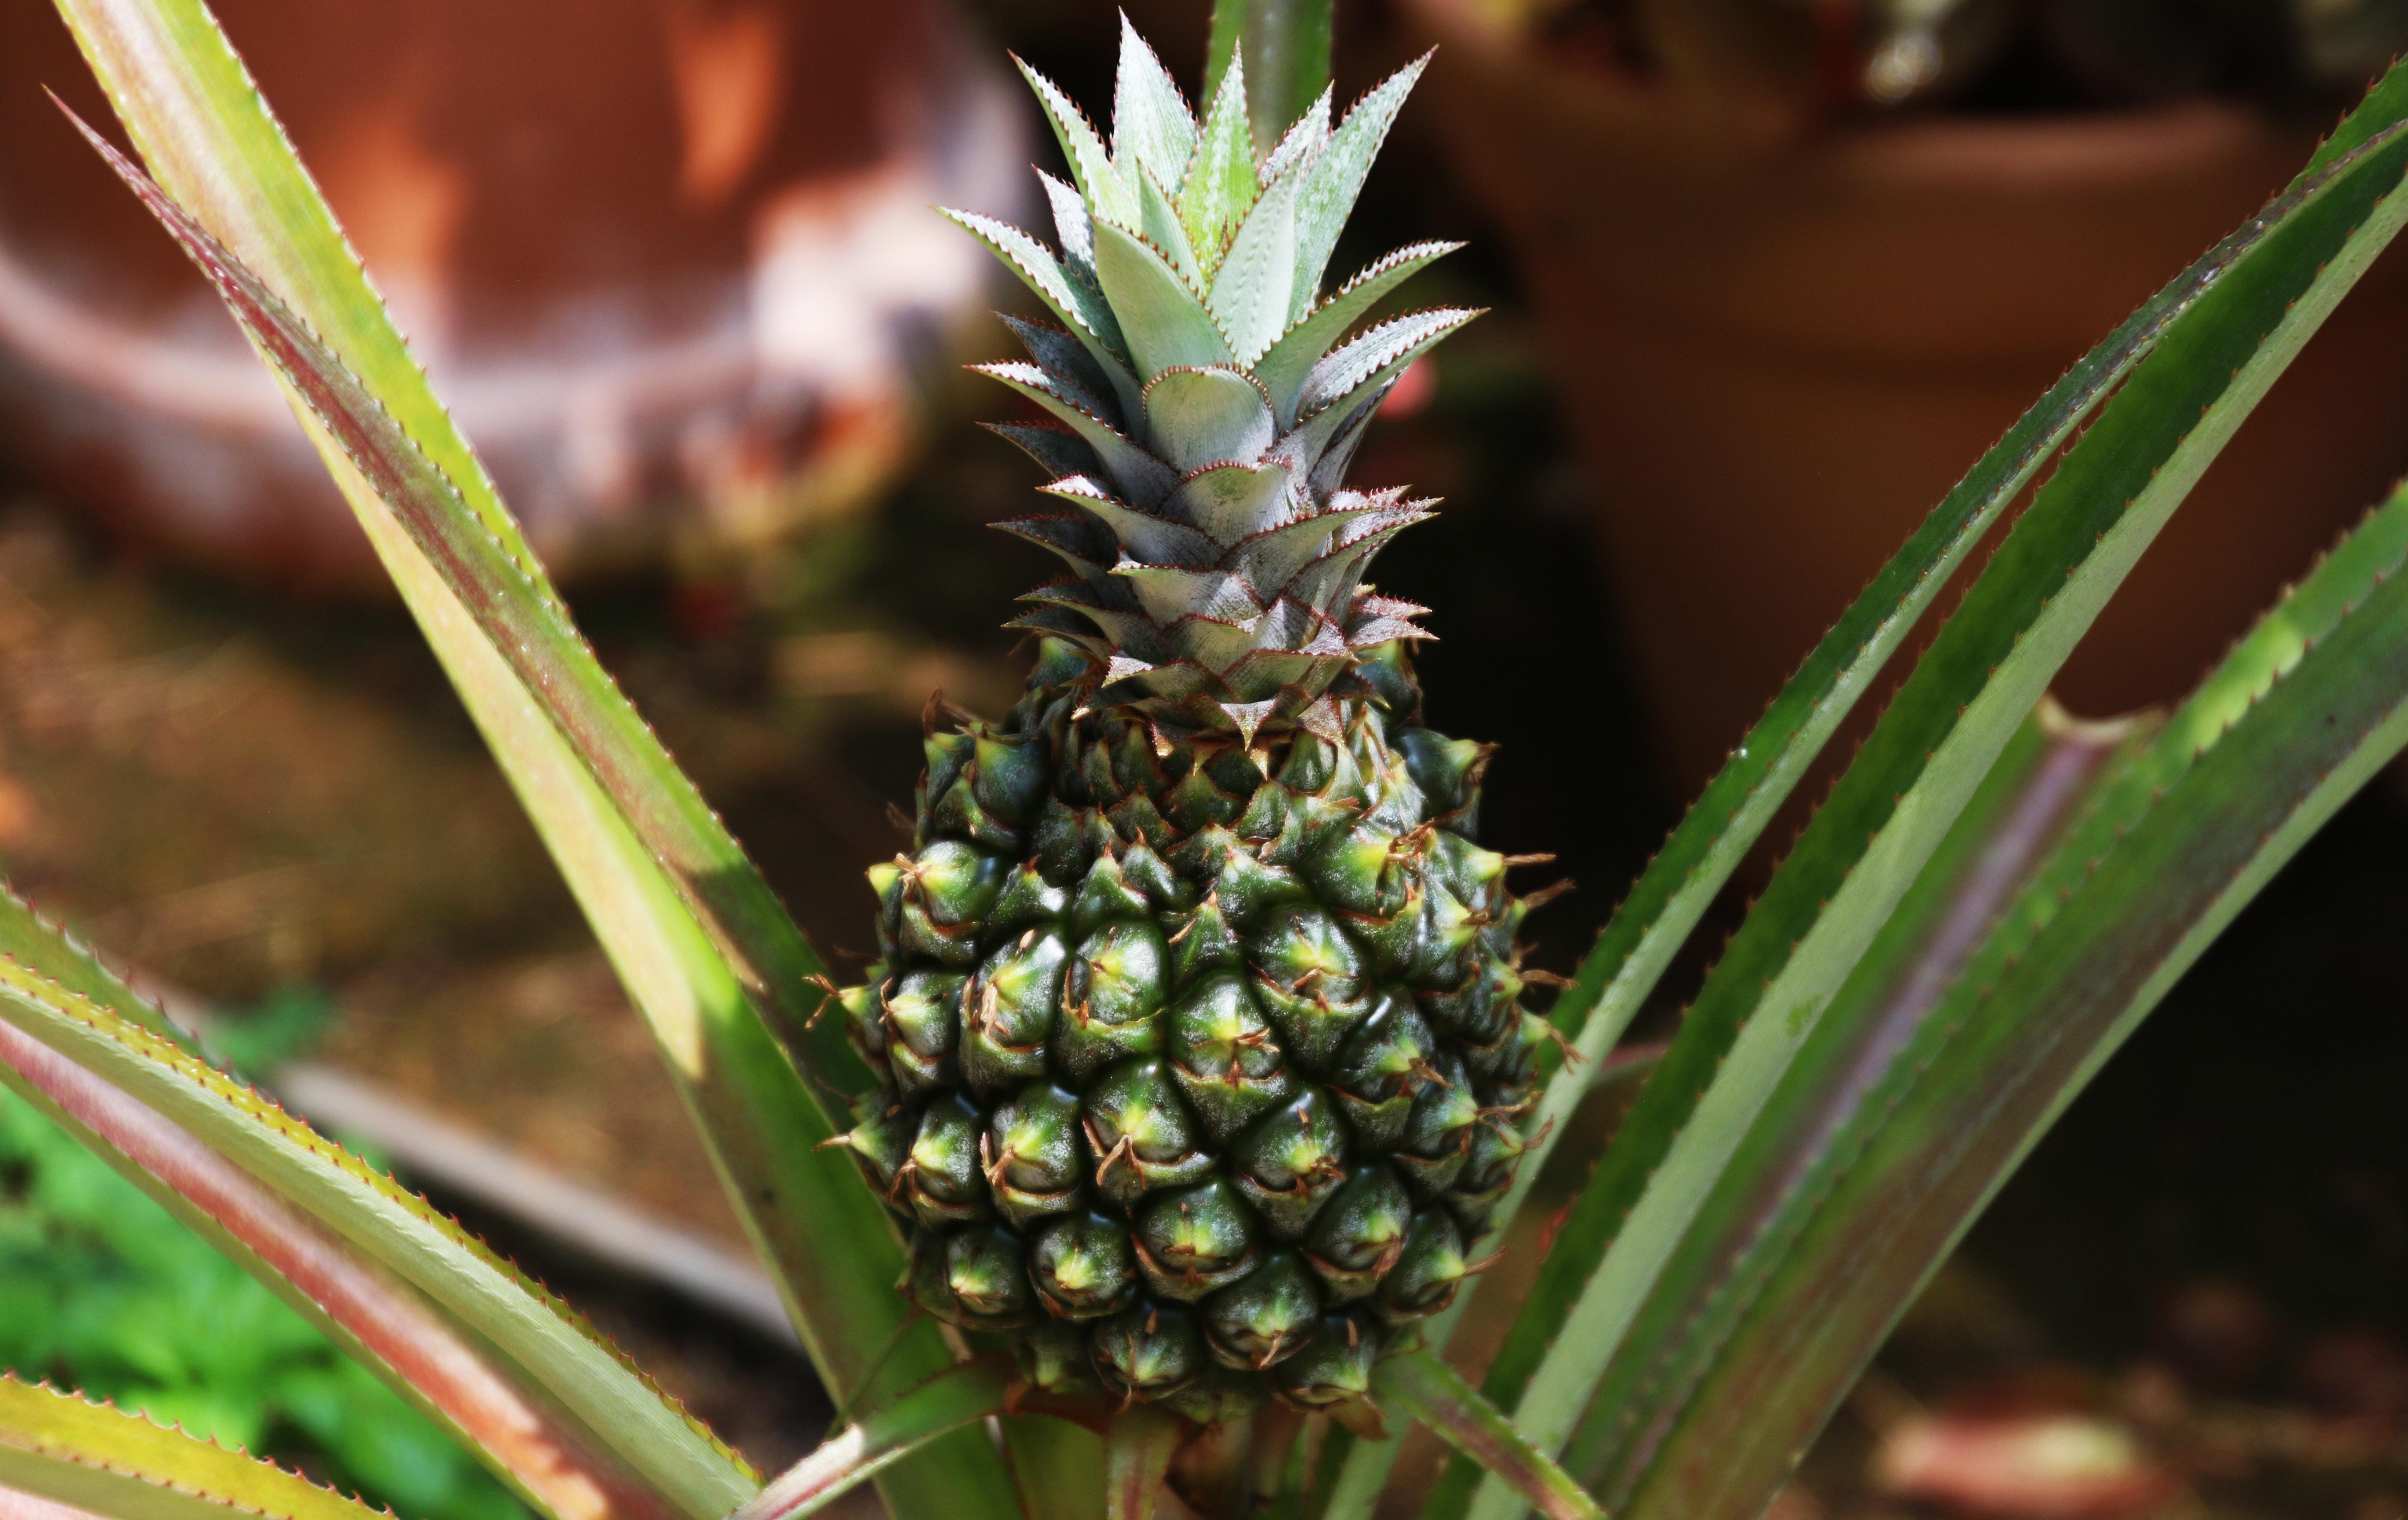 Blooming pineapple in the garden, Blooming pineapple in the garden